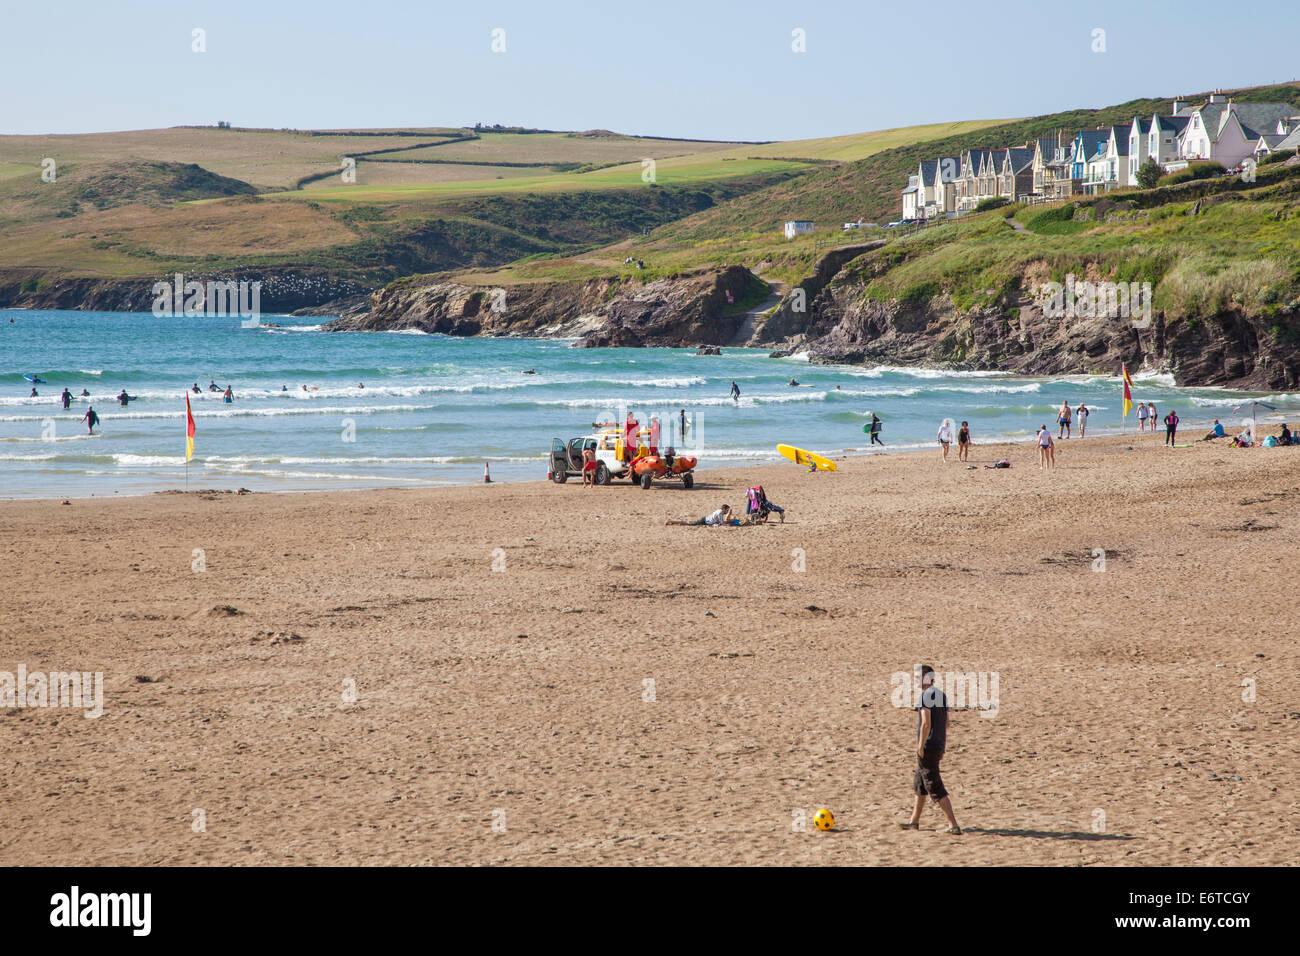 The beach and sea at Polzeath seaside resort, Cornwall, England, UK - Stock Image